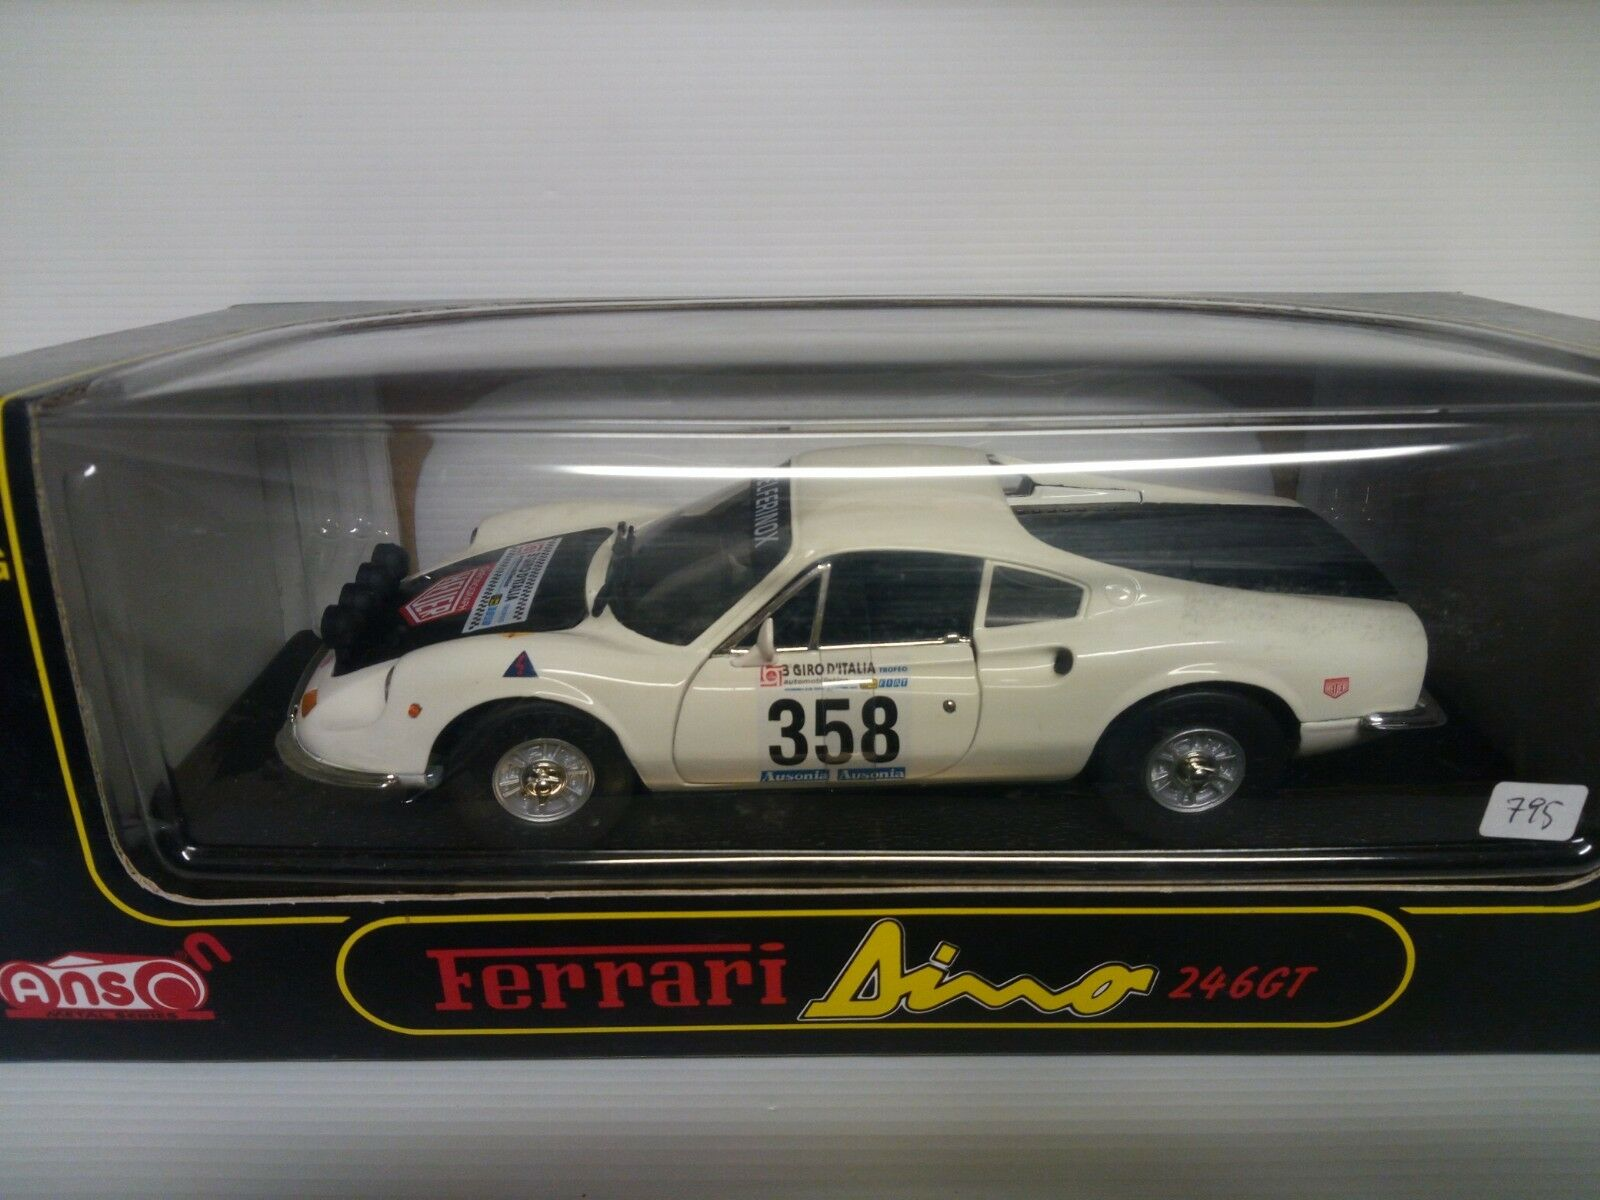 ANSON 1 18 FERRARI DINO 246 GT  358 GIRO D'ITALIA BOX